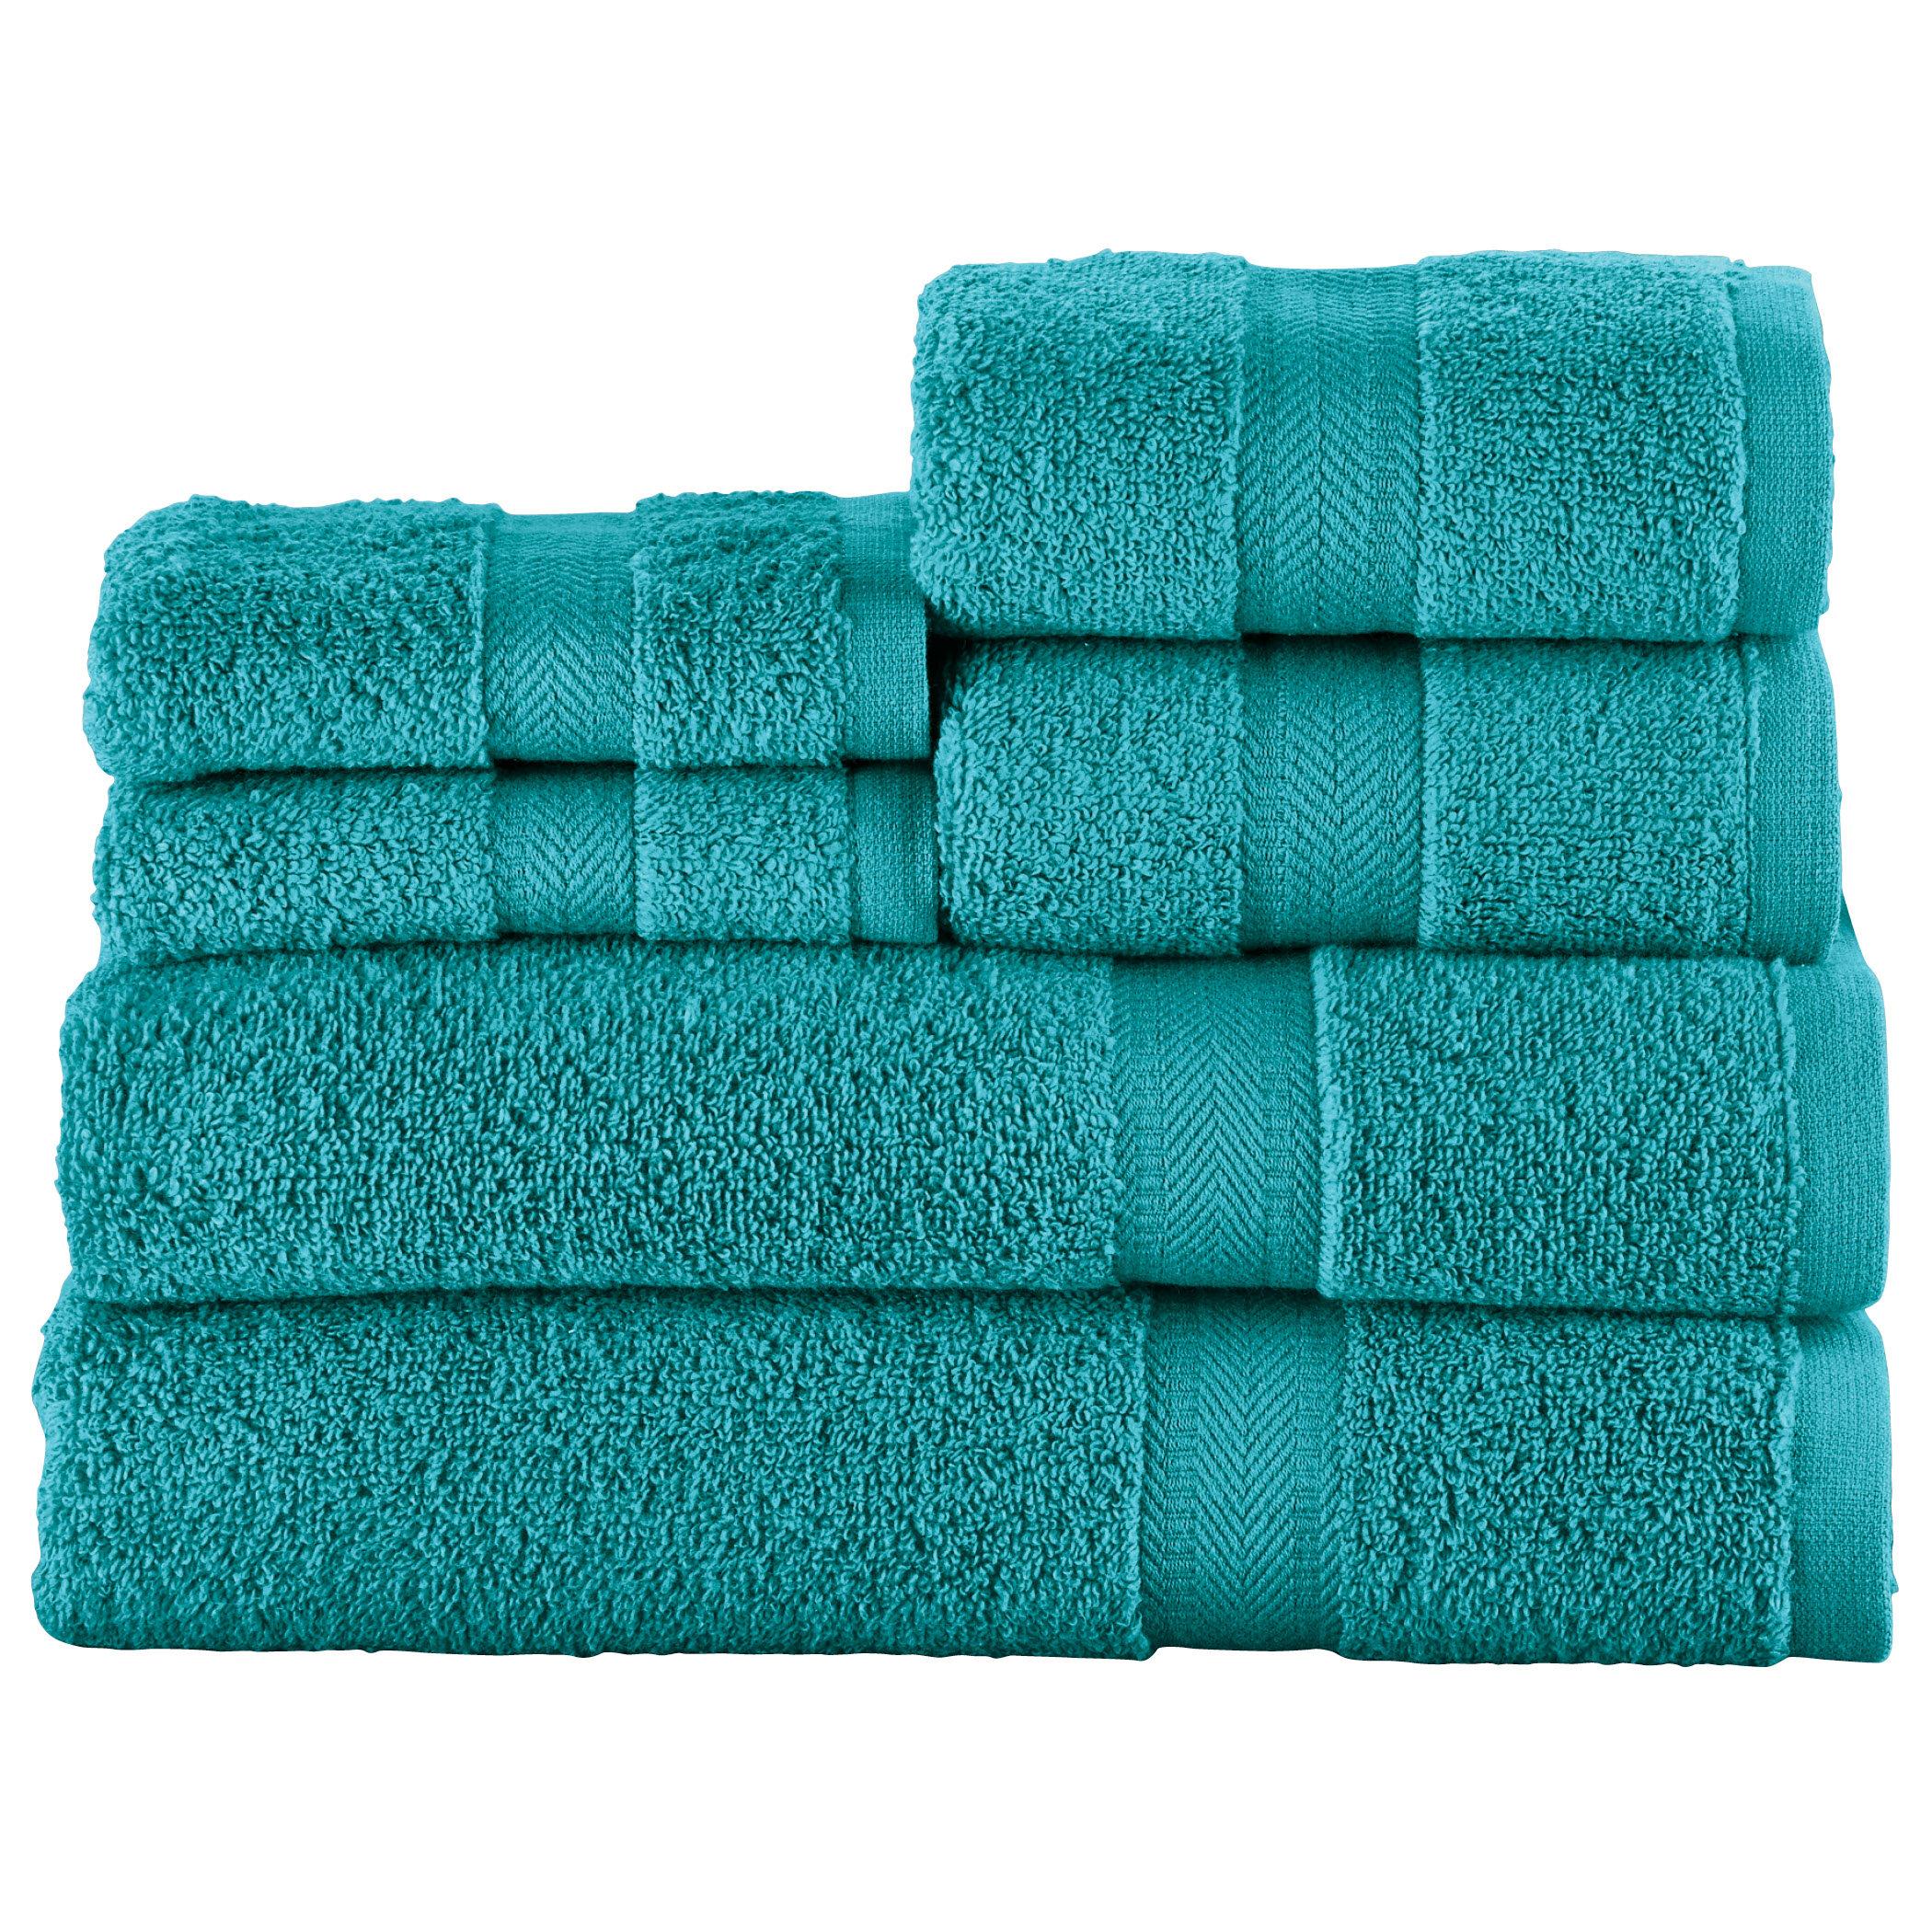 Latitude Run Brooke Louise Zero Twist 6 Piece 100 Cotton Bath Towel Set Reviews Wayfair